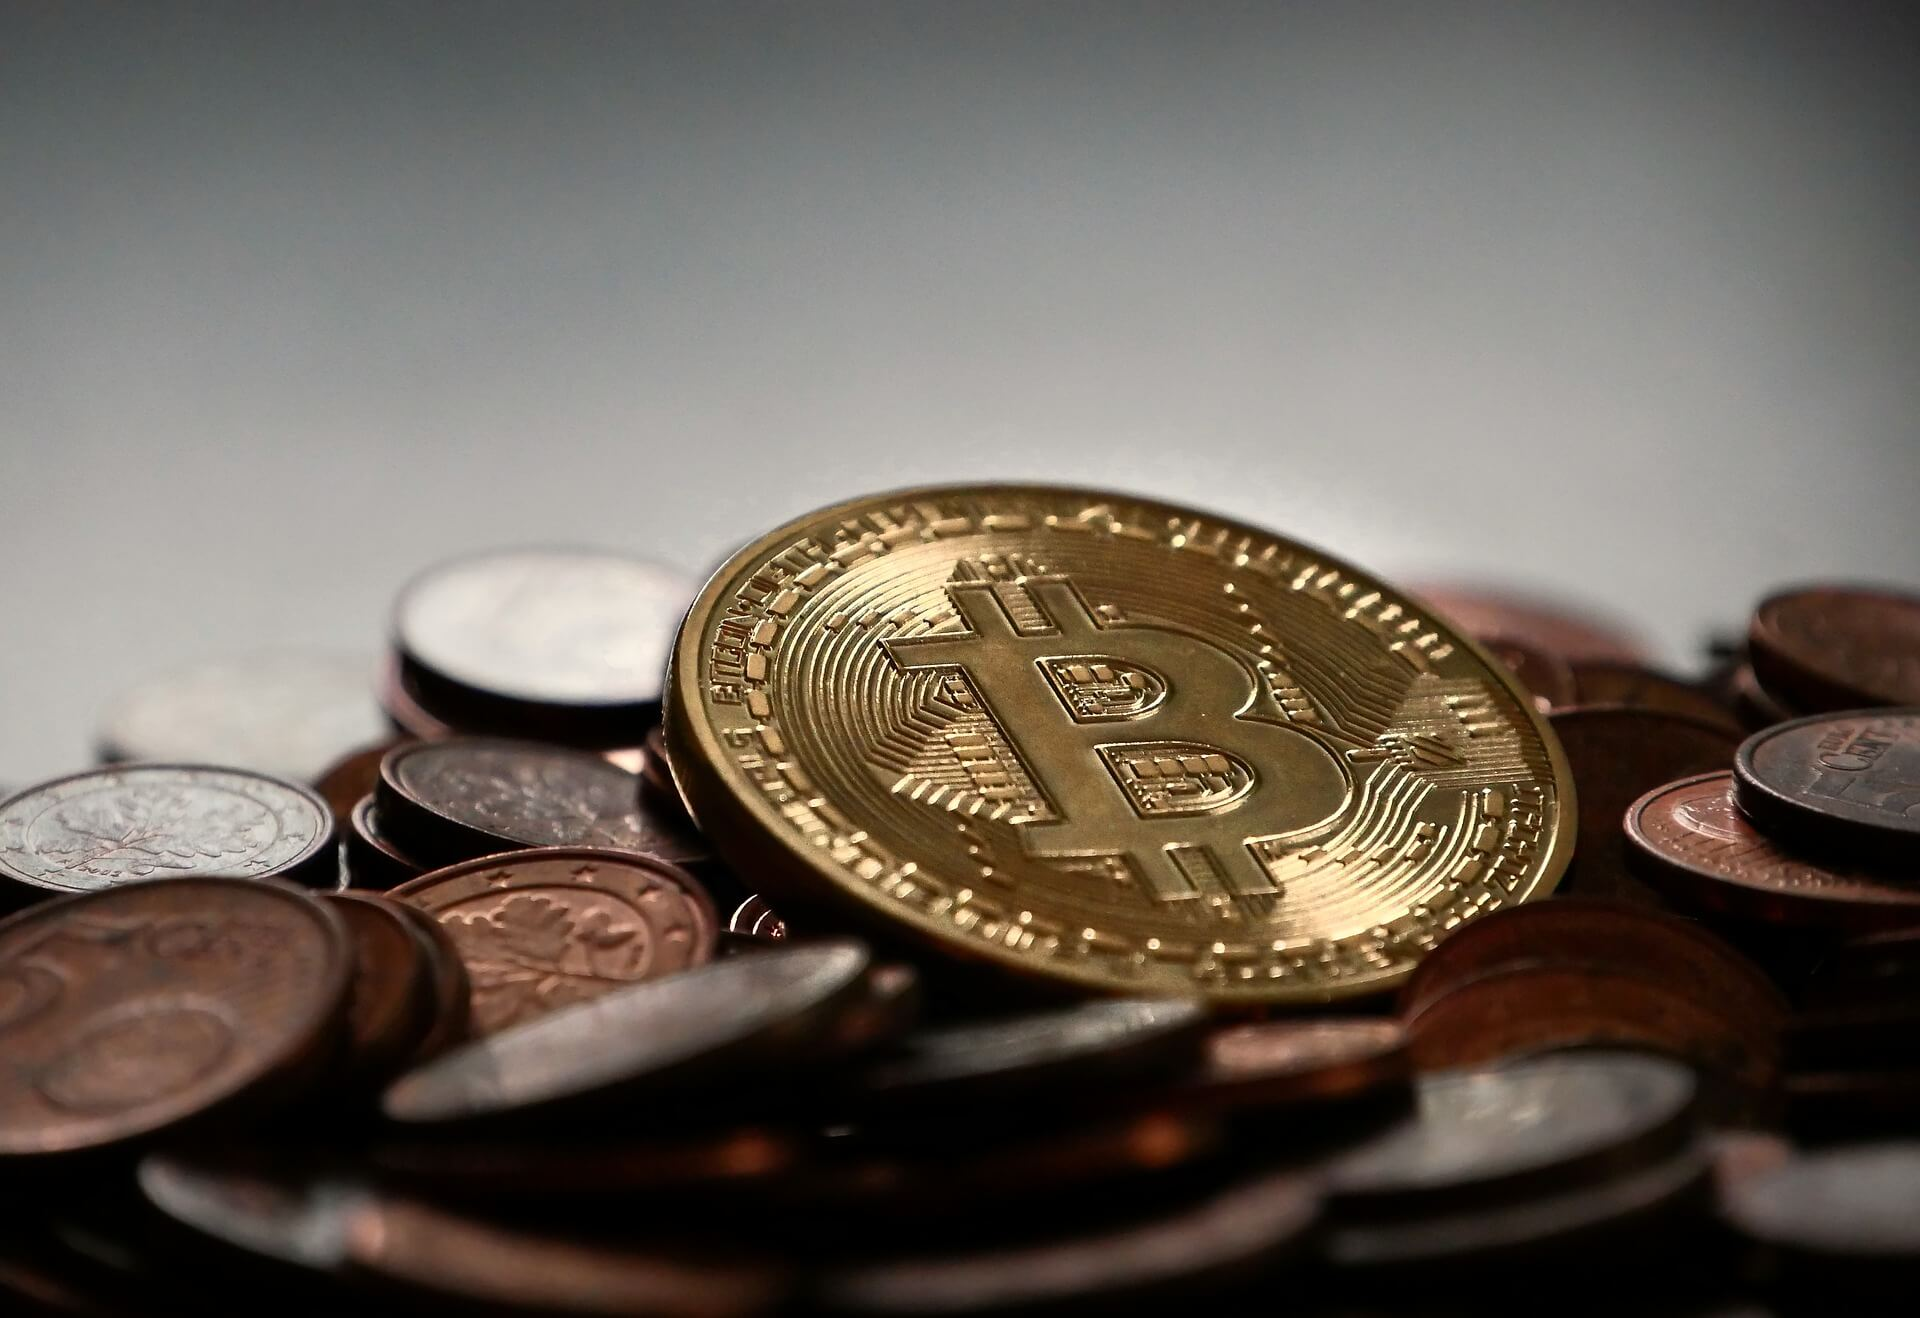 kaip jiems udirbti pinigus bitkoinas 2021 m bitcoin atm machine in san francisco